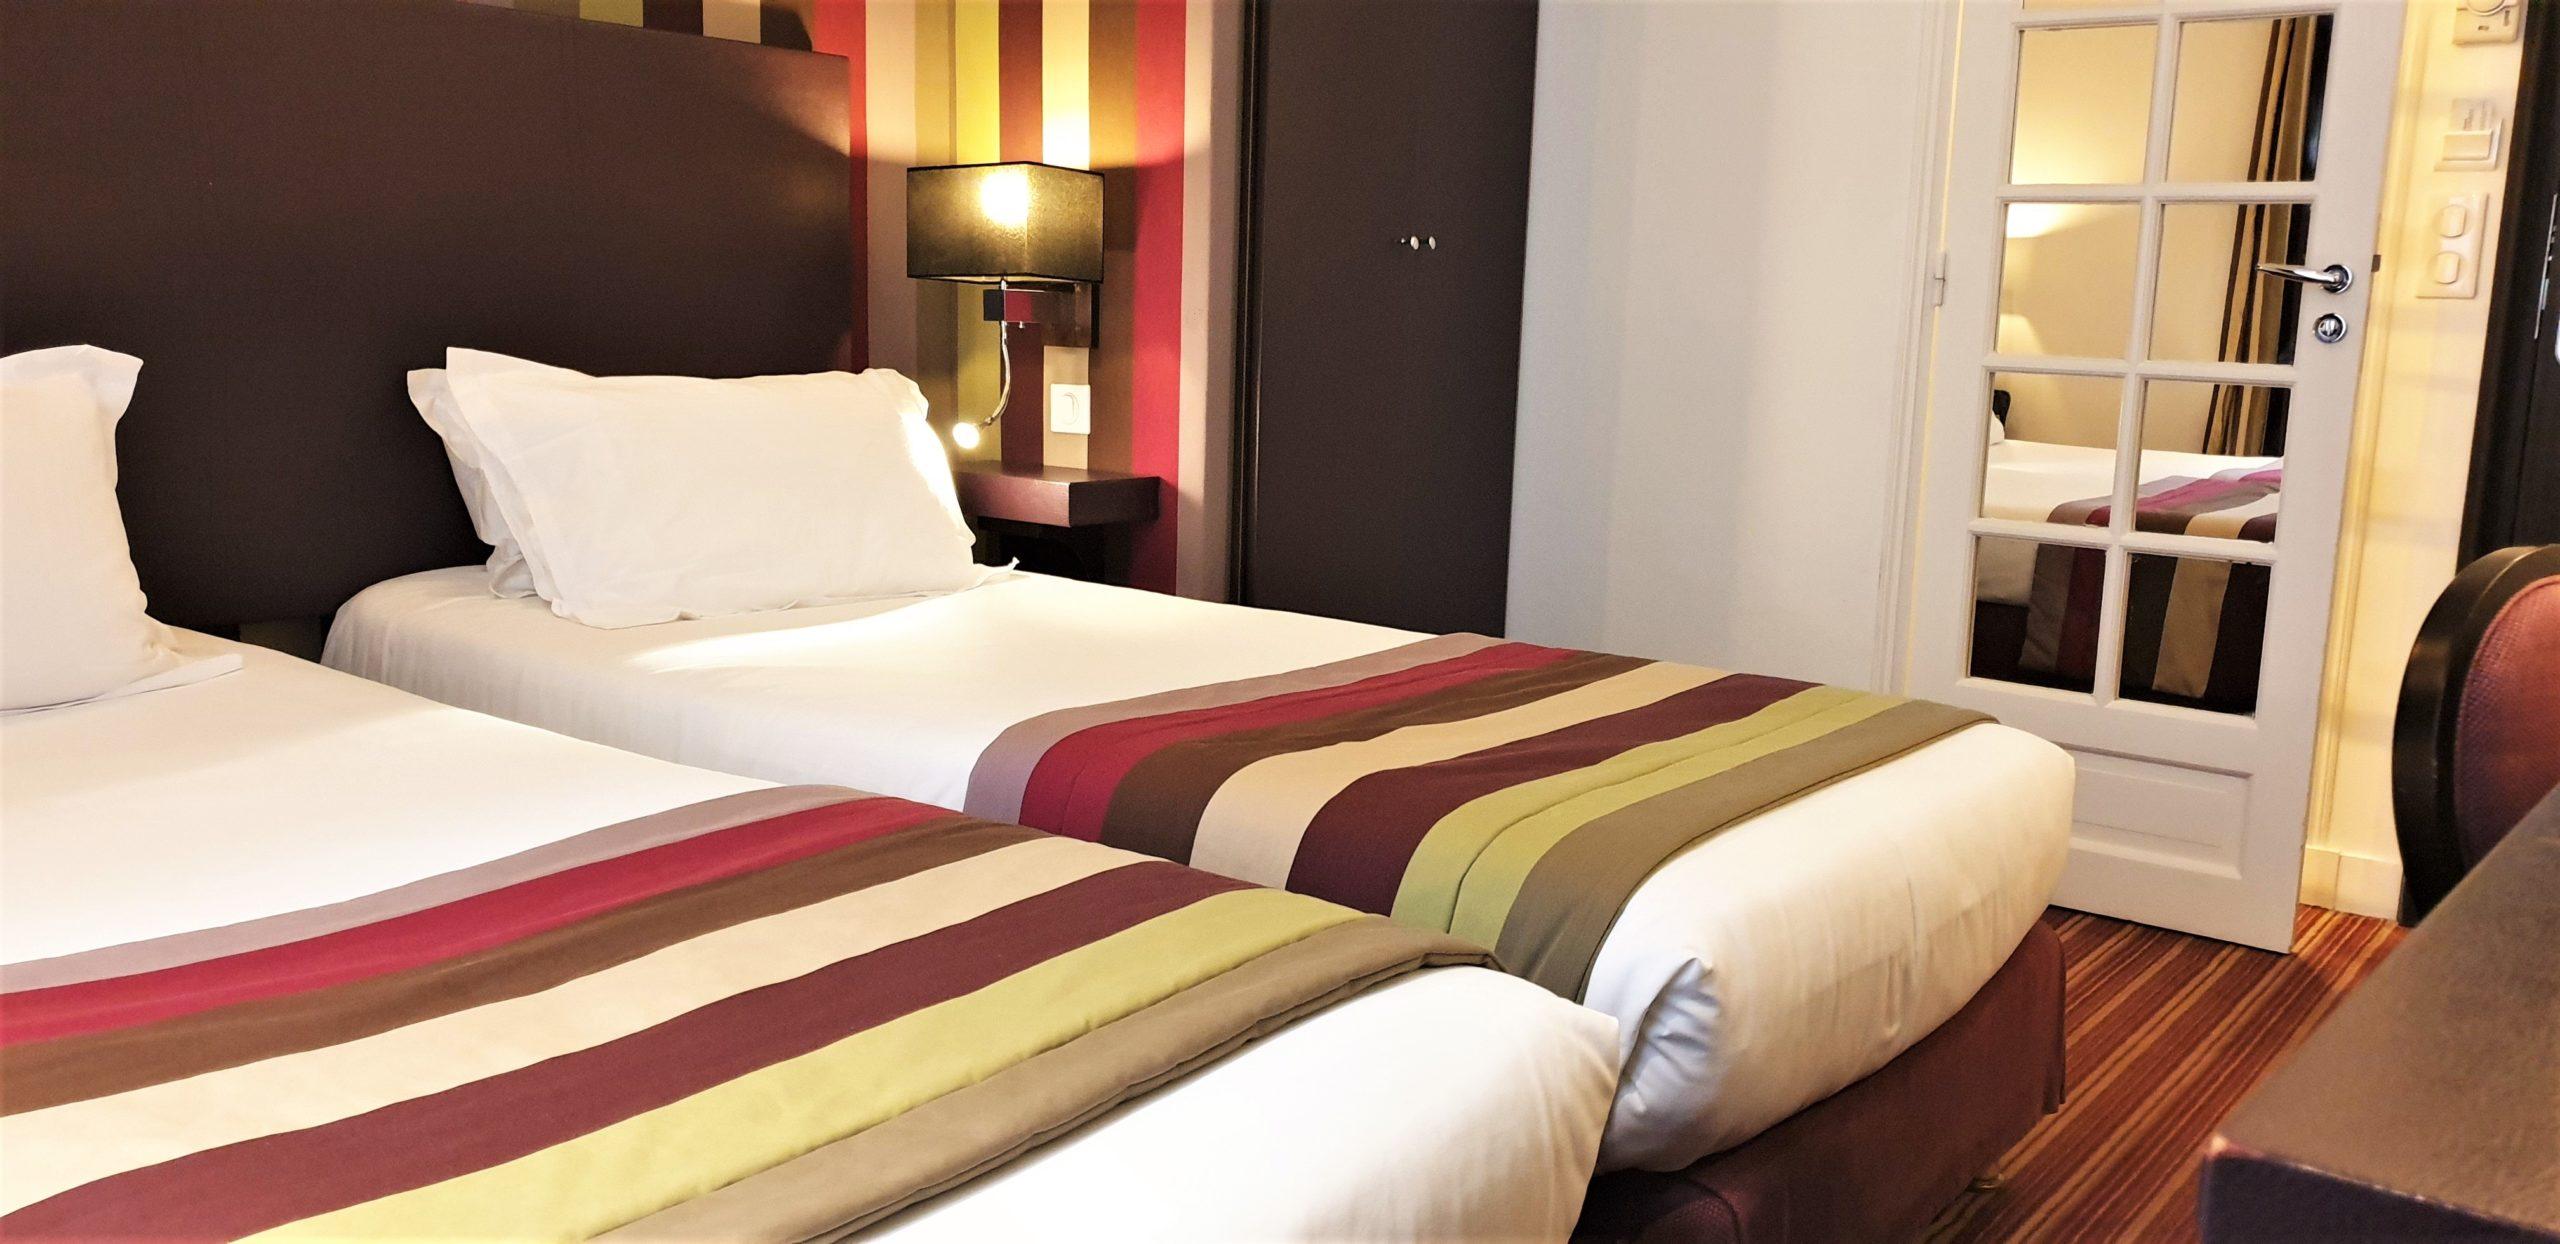 Chambre twin rayures - hôtel star champs-élysées